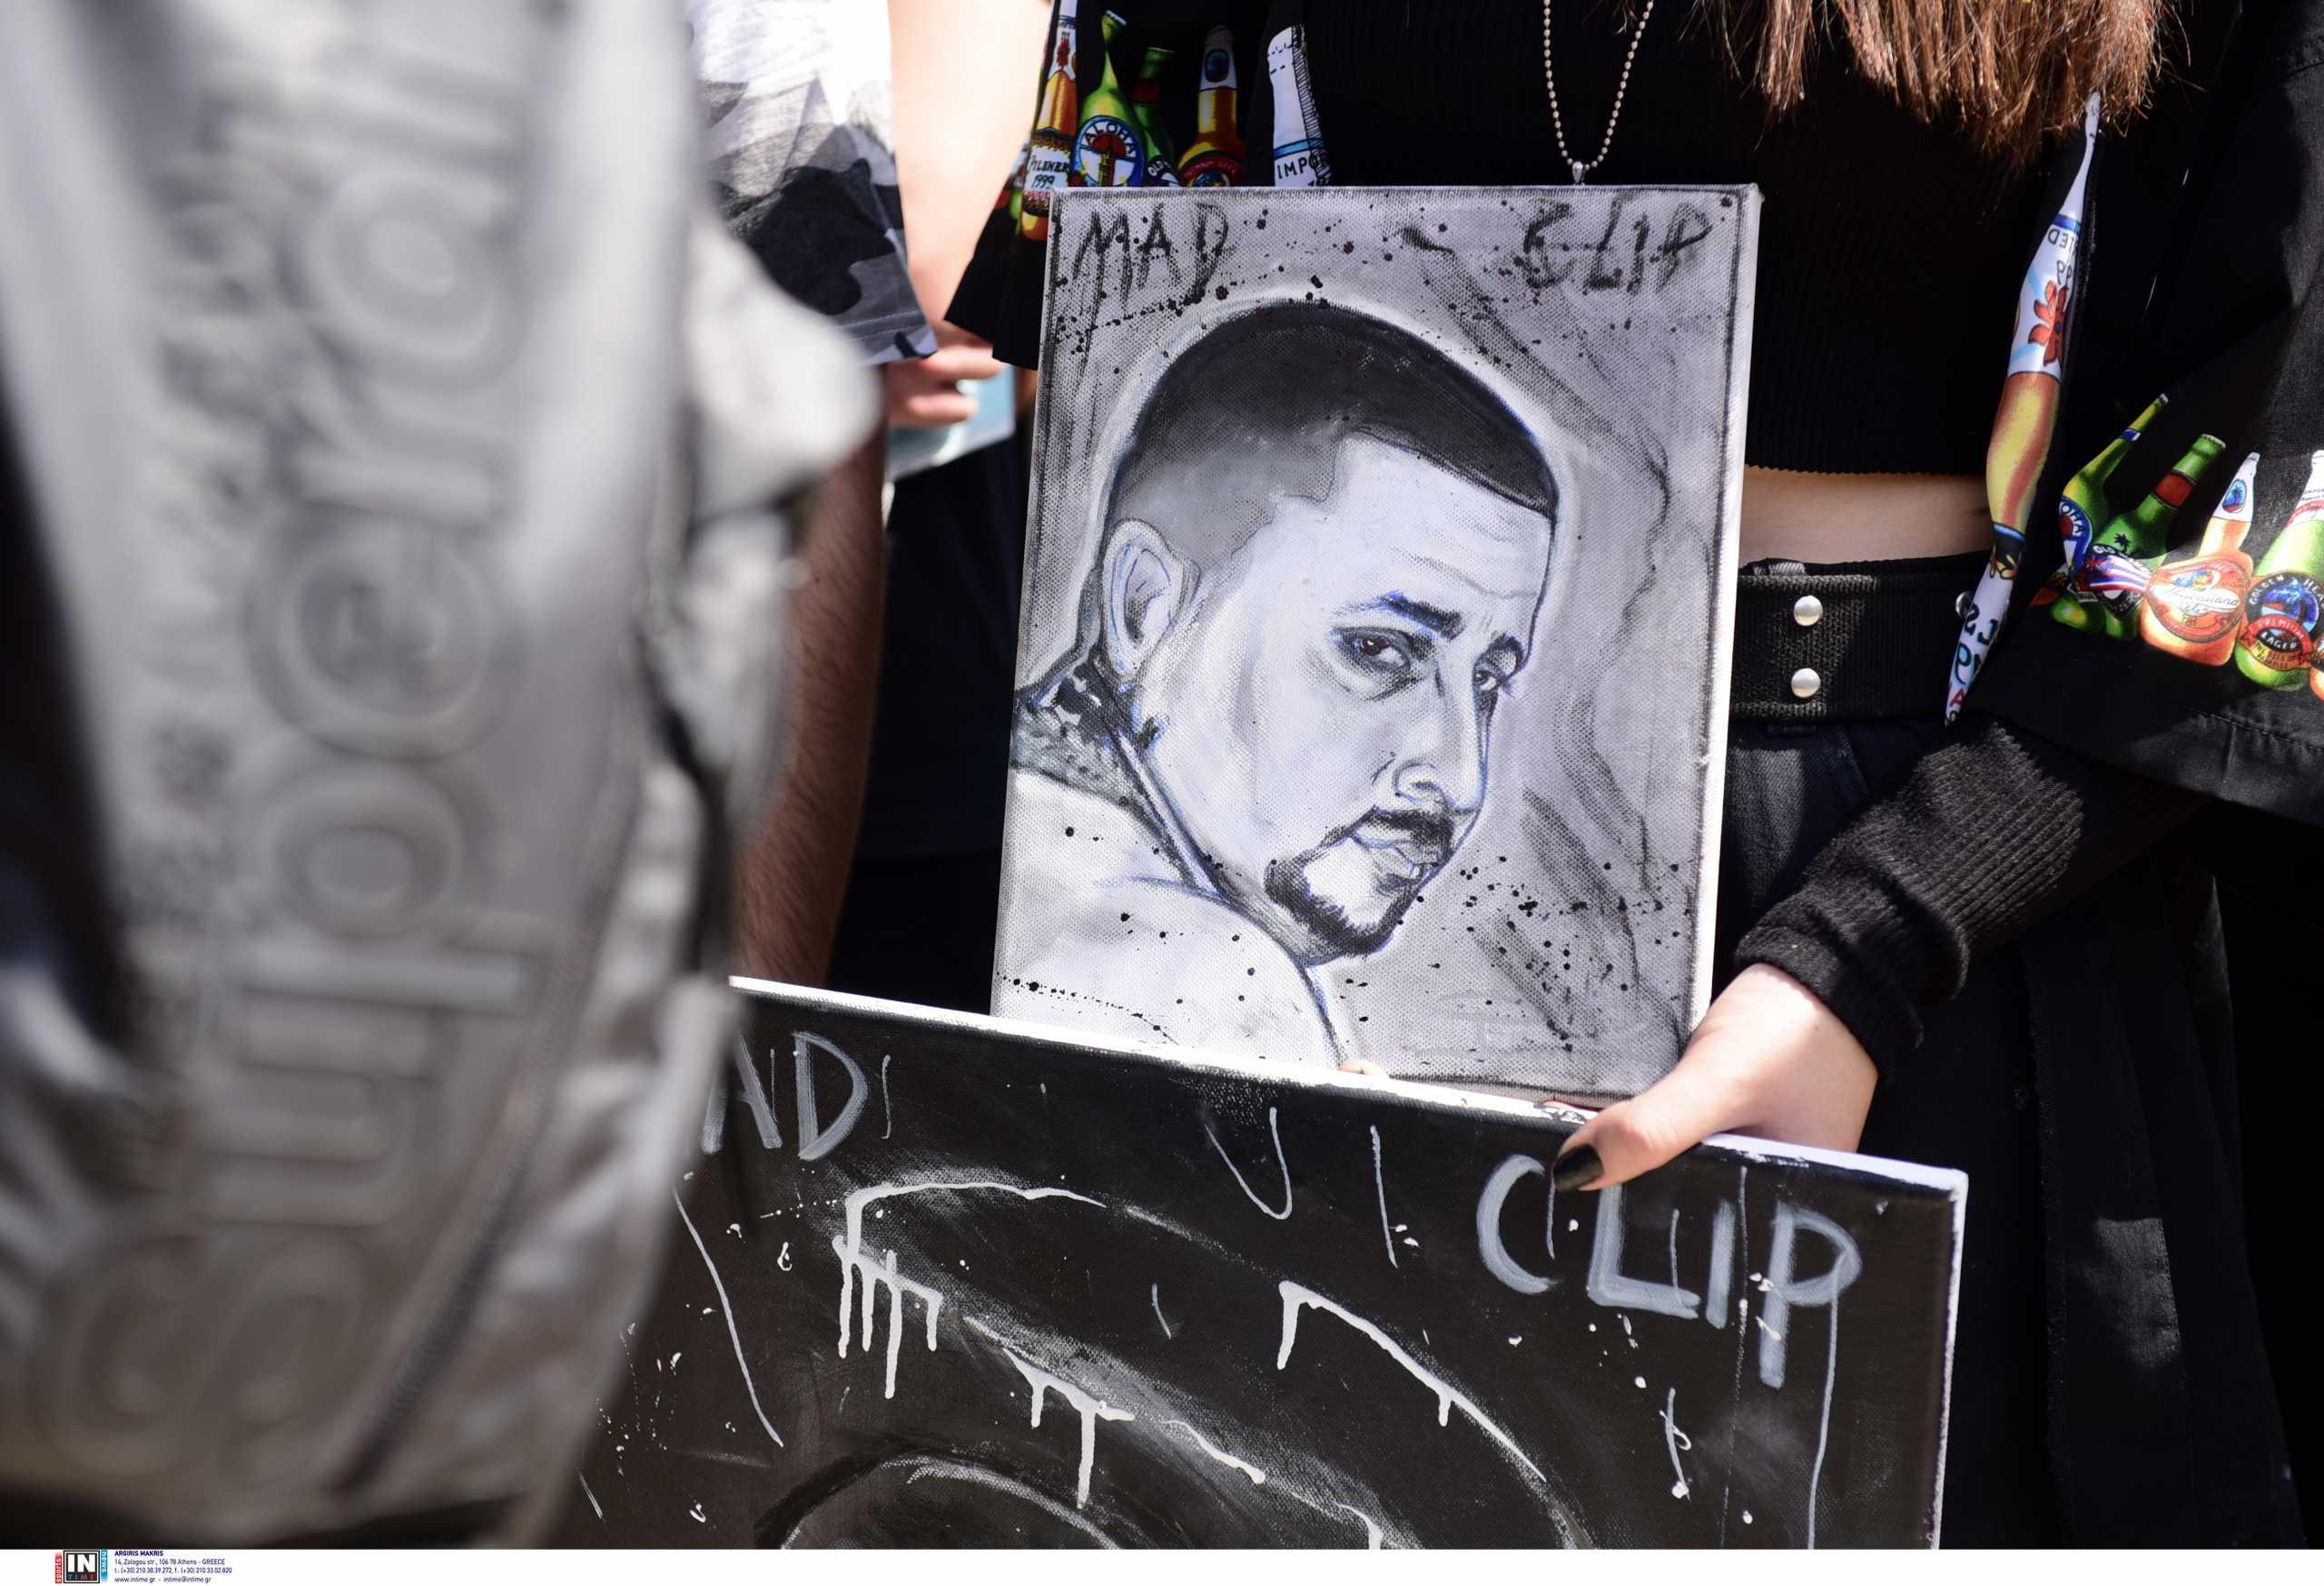 Mad Clip: Ασέβεια! Κατέστρεψαν μνήμα 20χρονης στην κηδεία του τράπερ